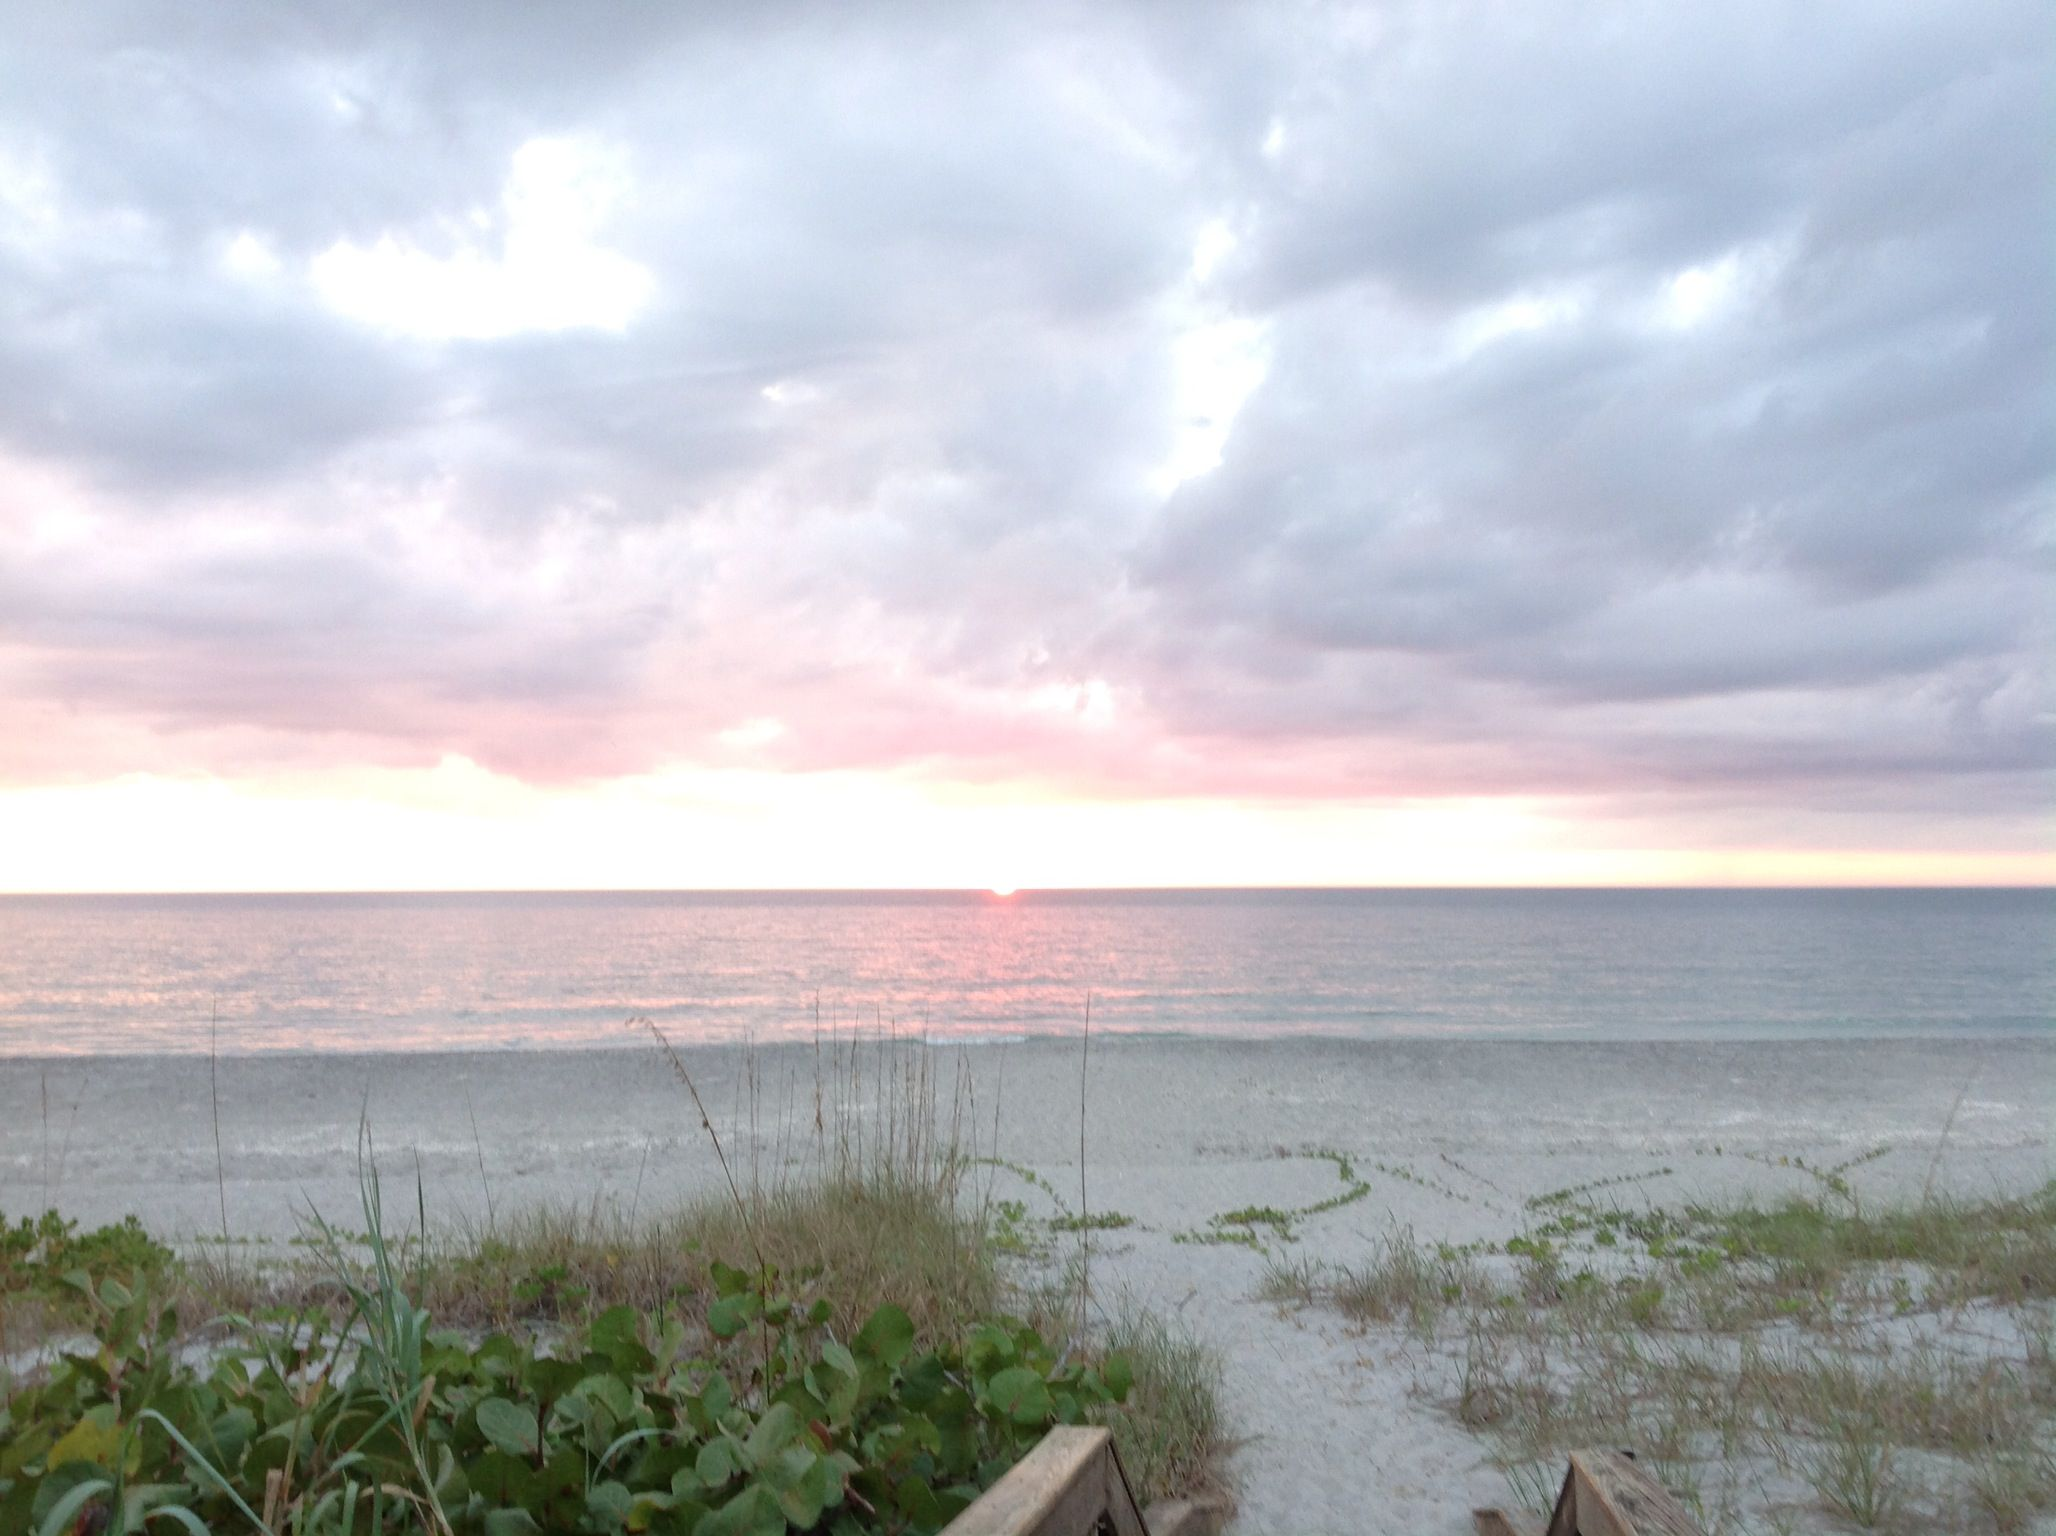 Manasota key beach | Florida vacation, Beach, Trip